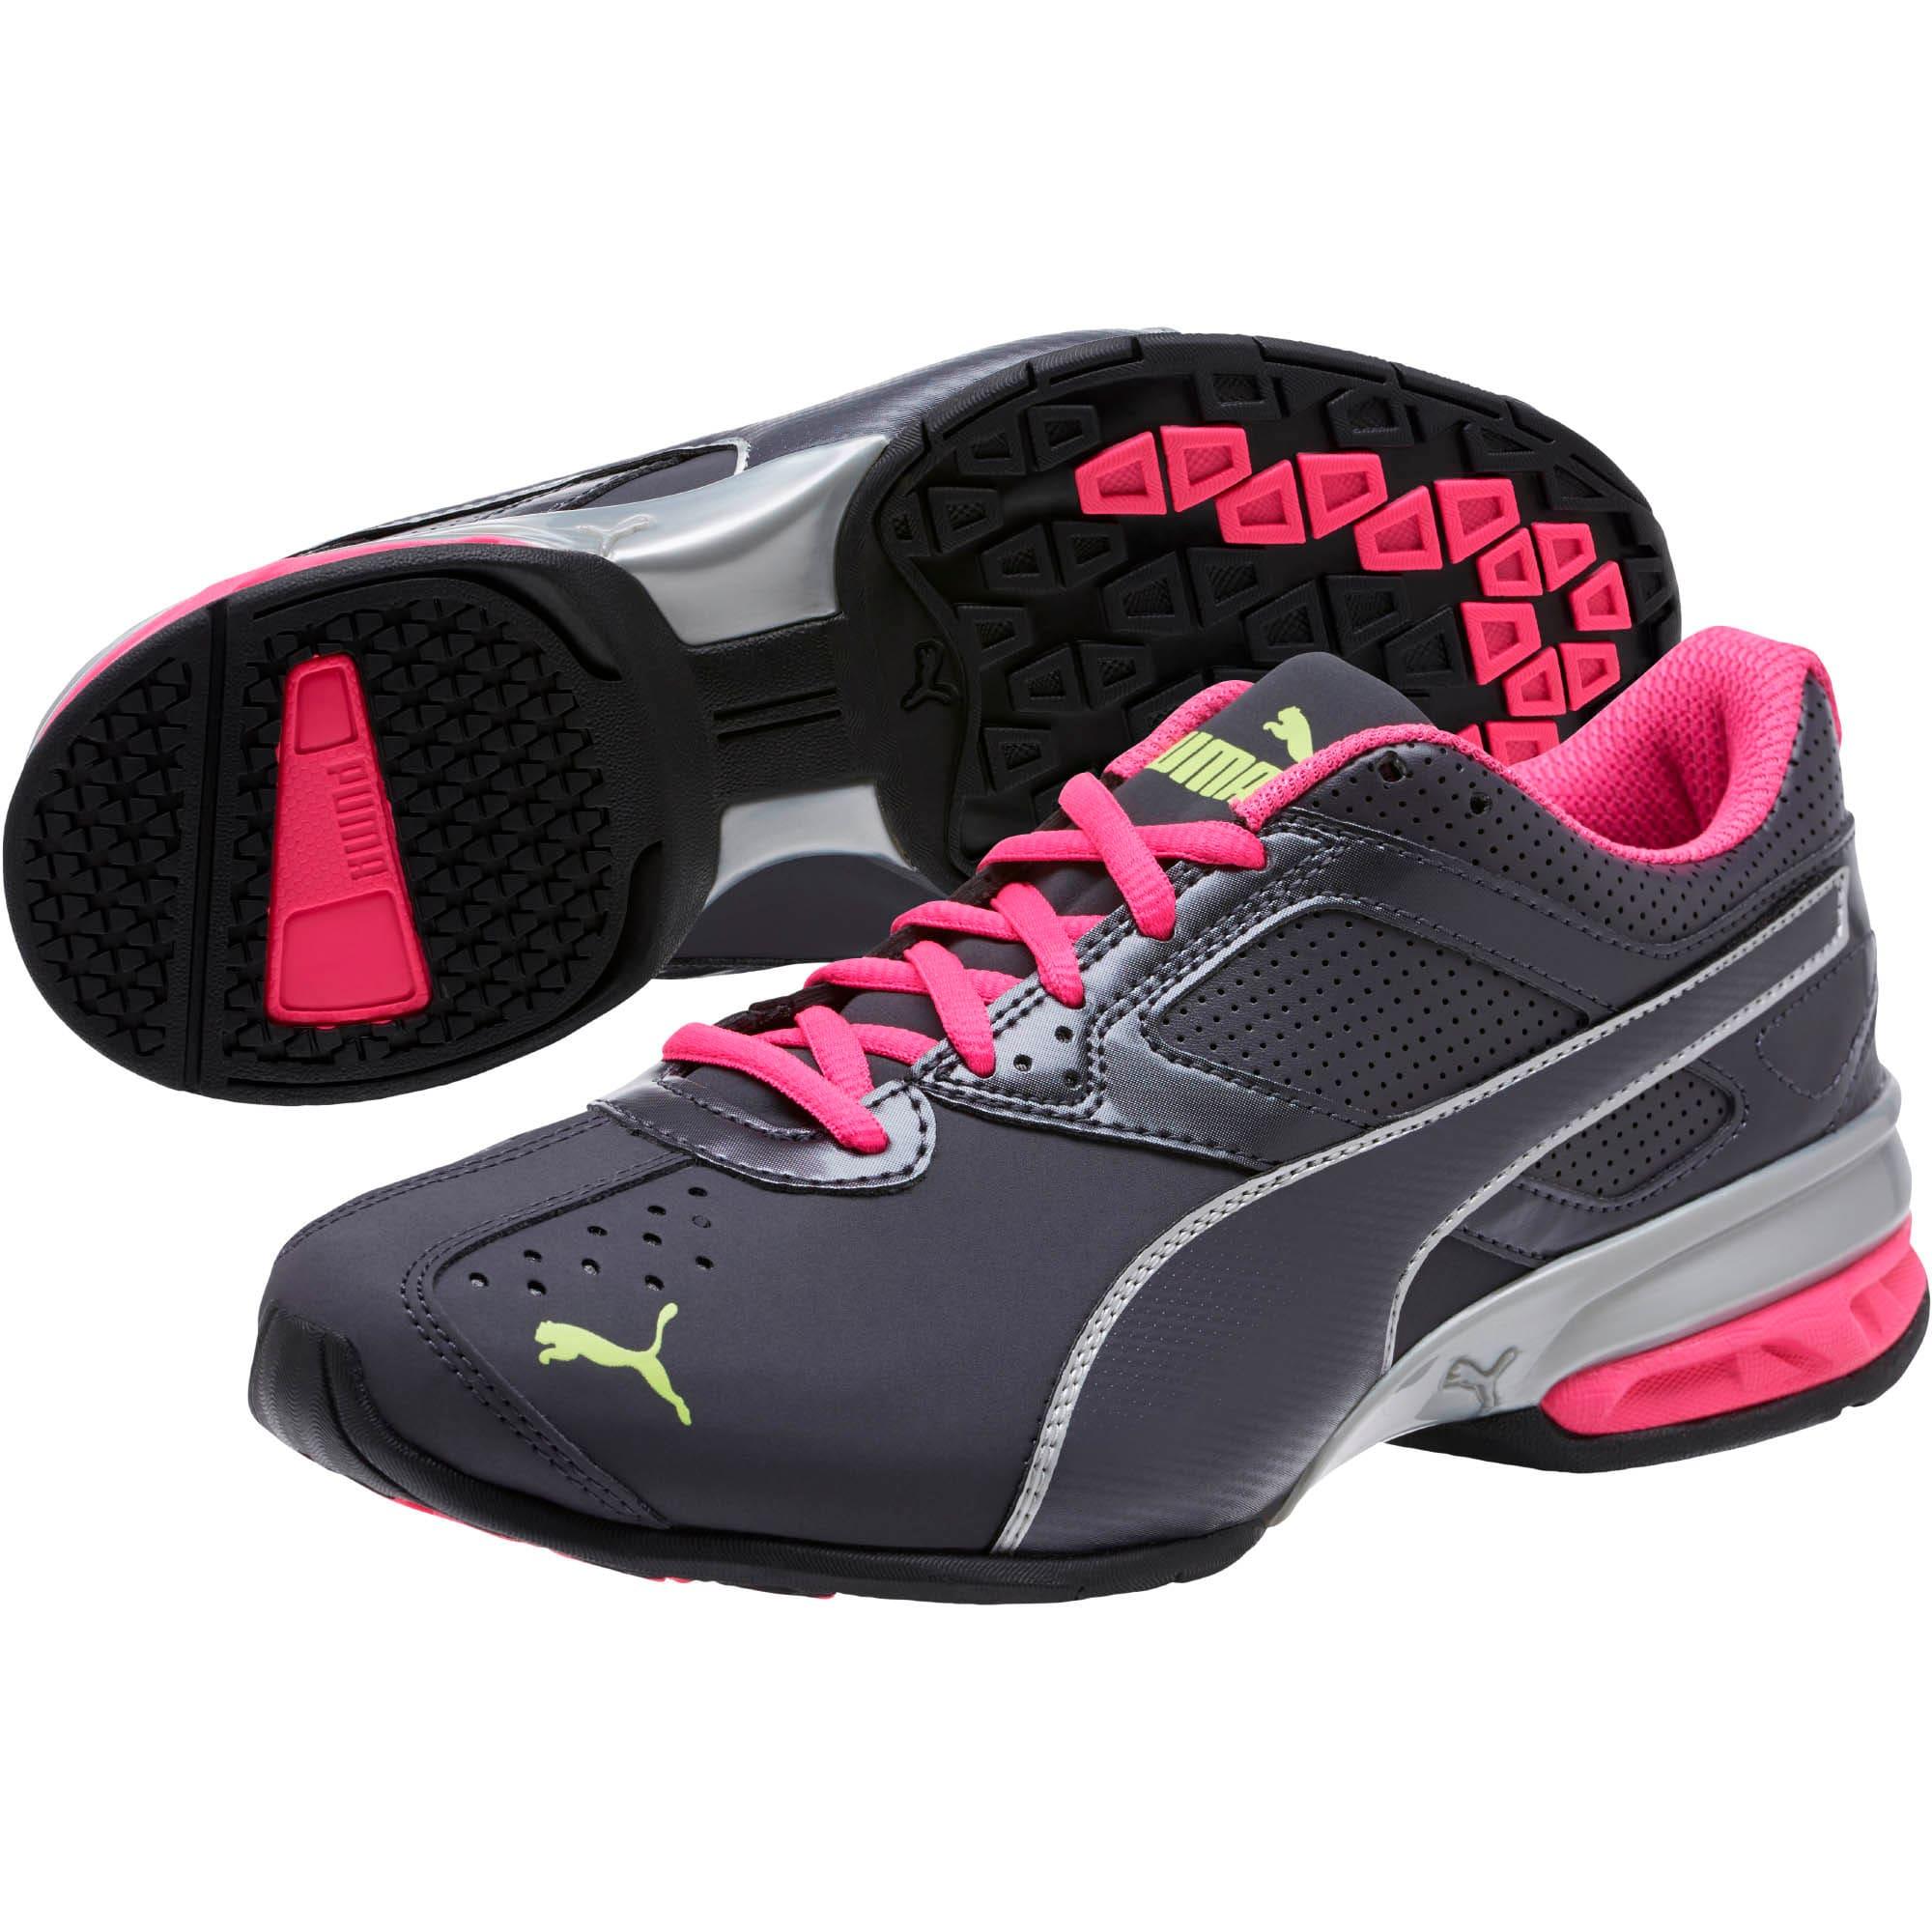 Thumbnail 2 of Tazon 6 FM Women's Sneakers, Periscope-Silver-Pink Glo, medium